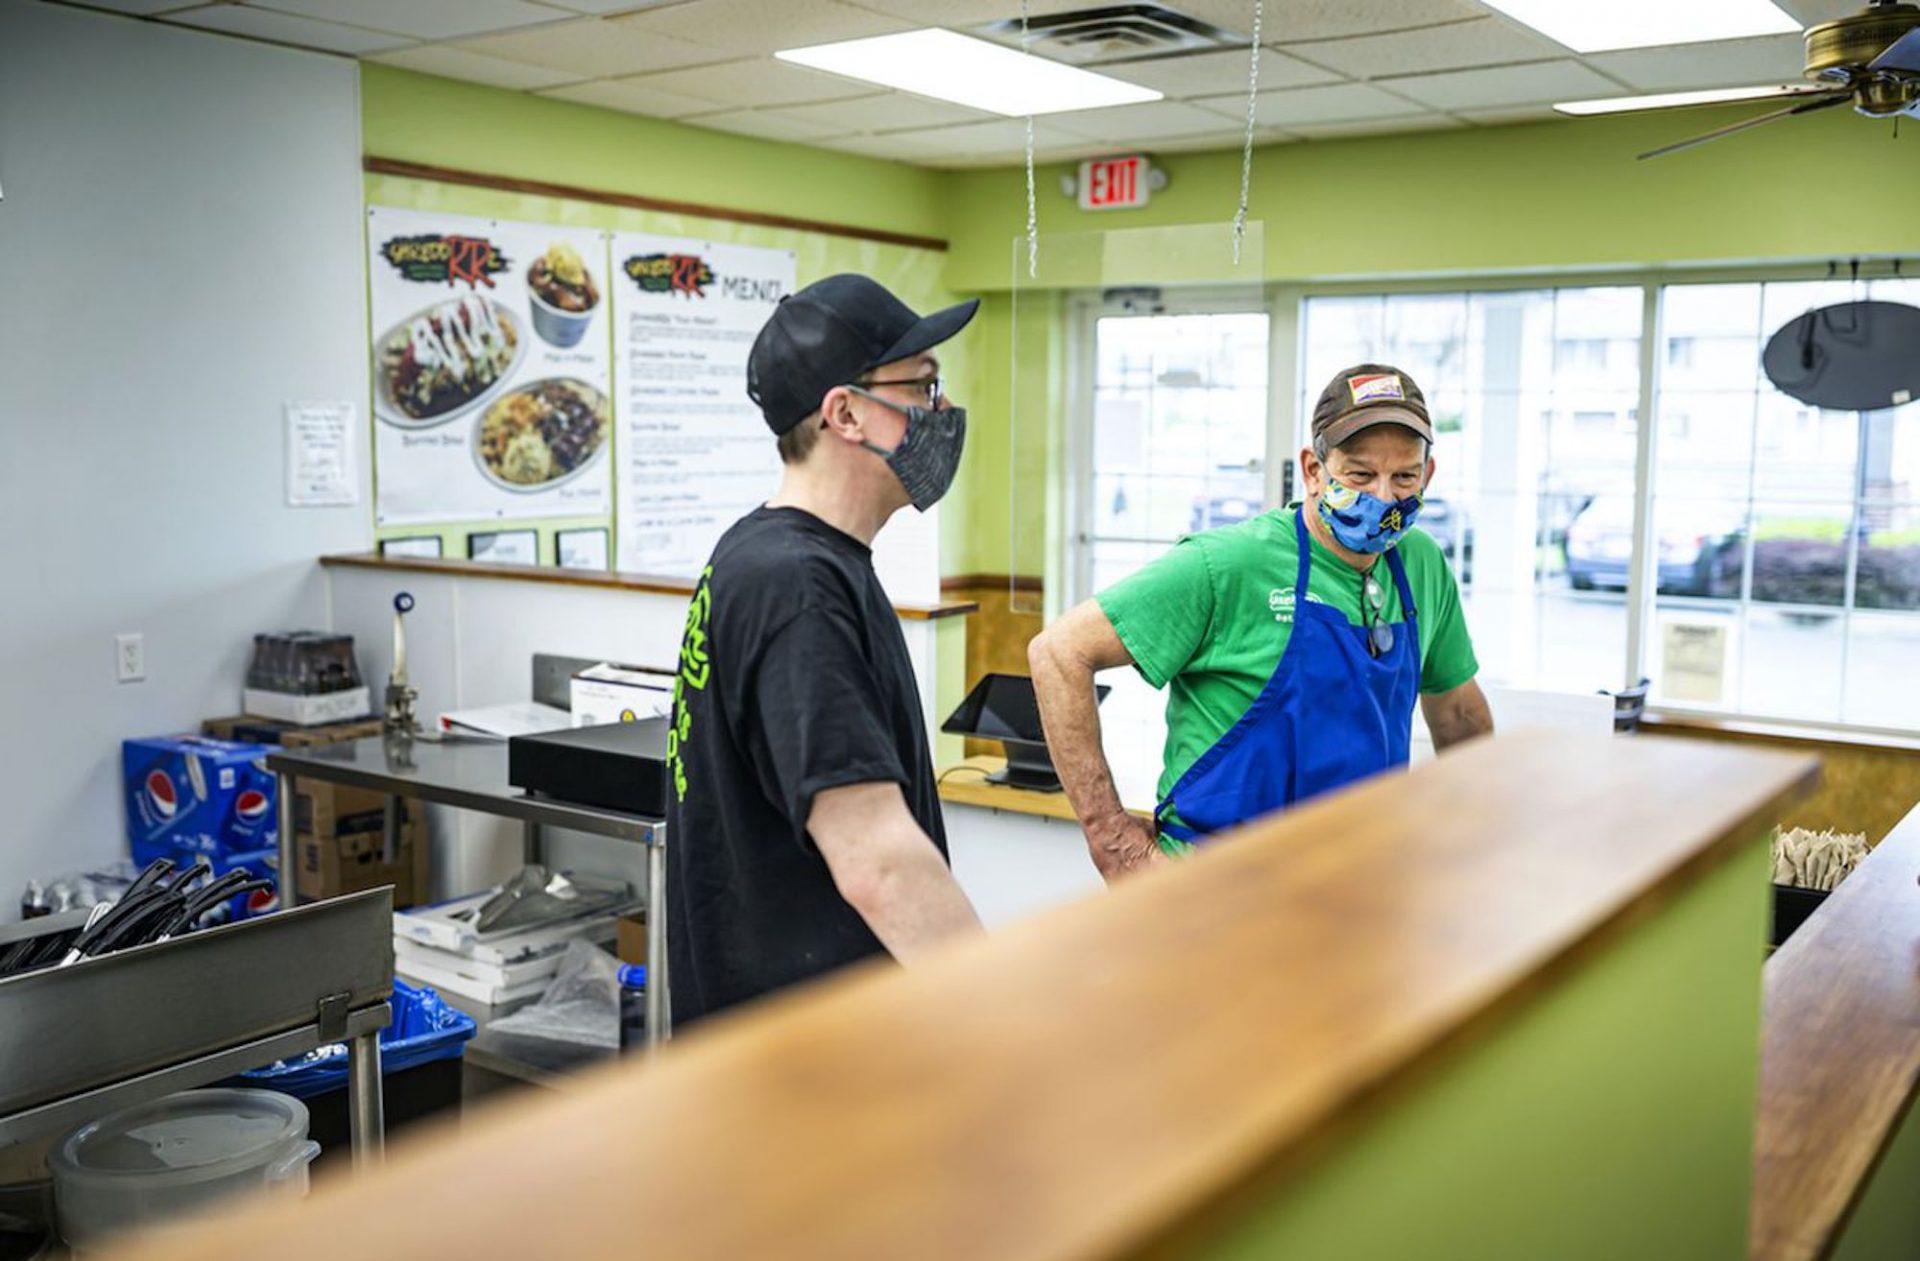 Manager Nick Coley, left, and co-owner Rob Billet. ShreddRRz restaurant opens at 7839 Allentown Blvd. in West Hanover Township. April 14, 2021.